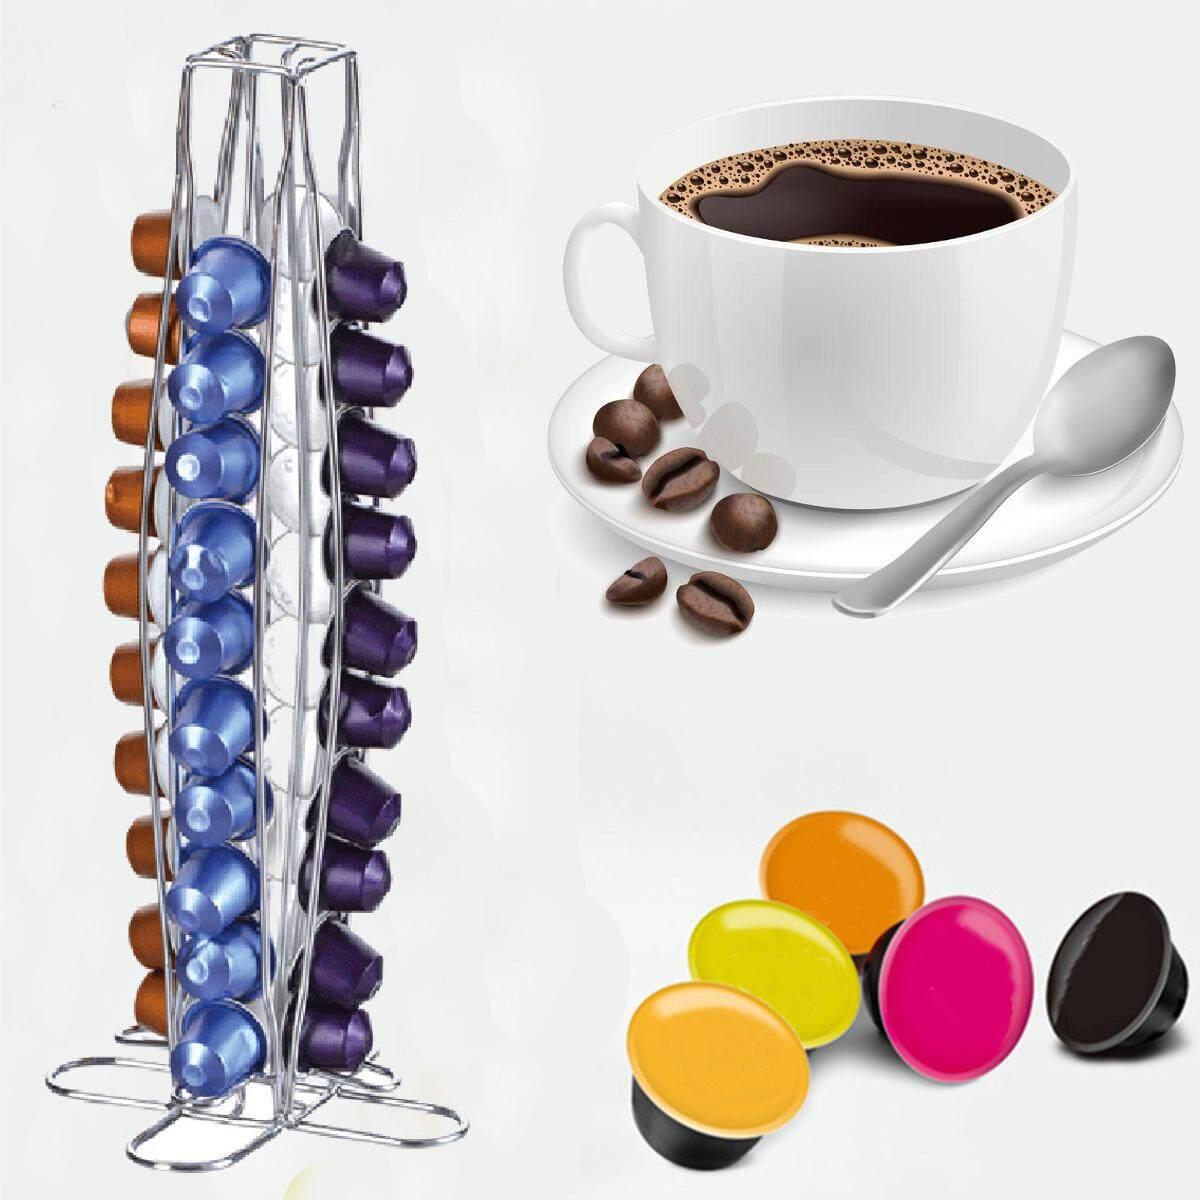 da15c853173 Latest No Brand Coffee Making Accessories Products | Enjoy Huge ...